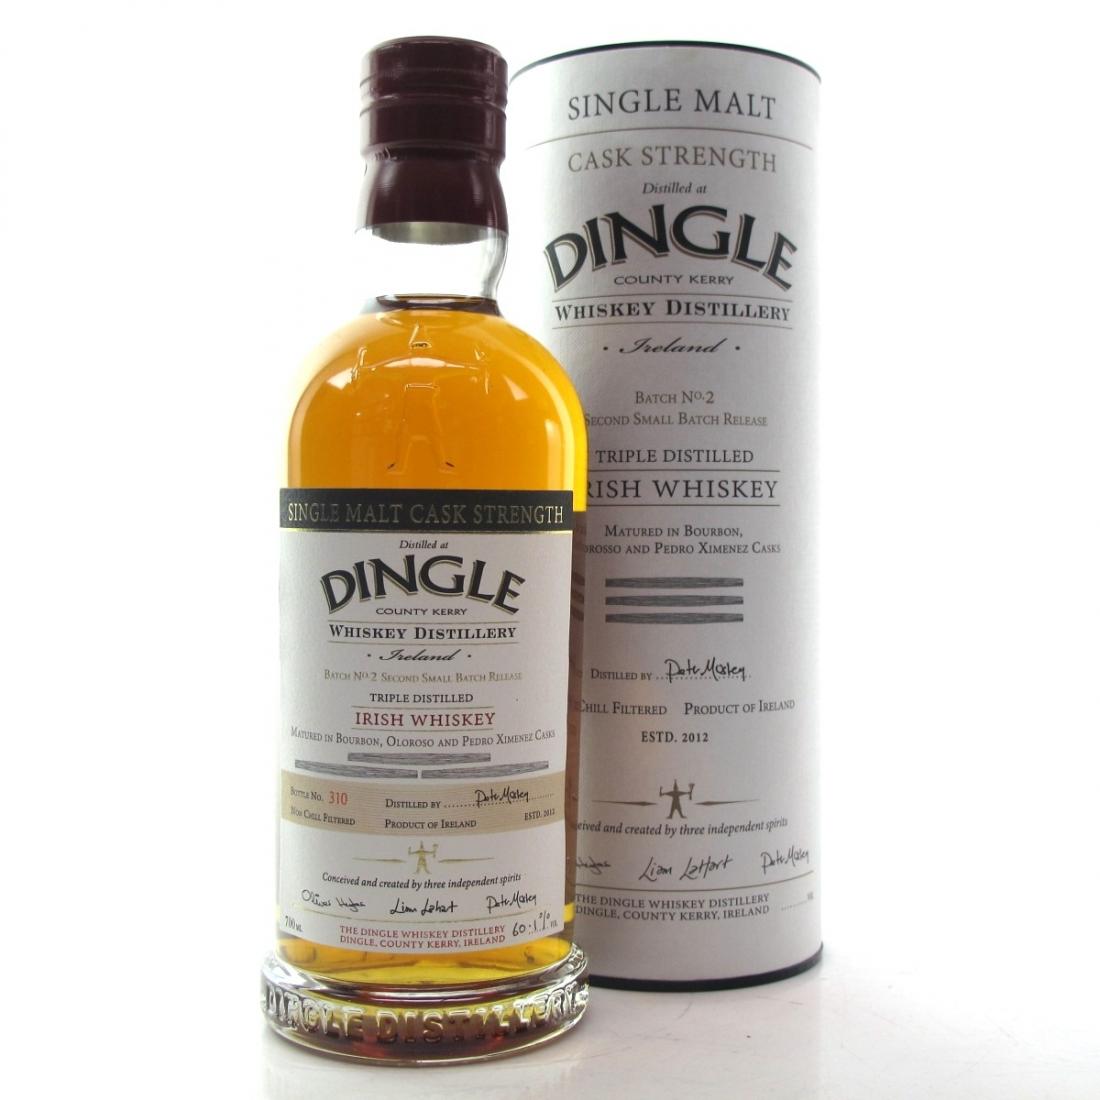 Dingle Irish Single Malt Cask Strength Batch No. 2 / Bourbon and Sherry Casks